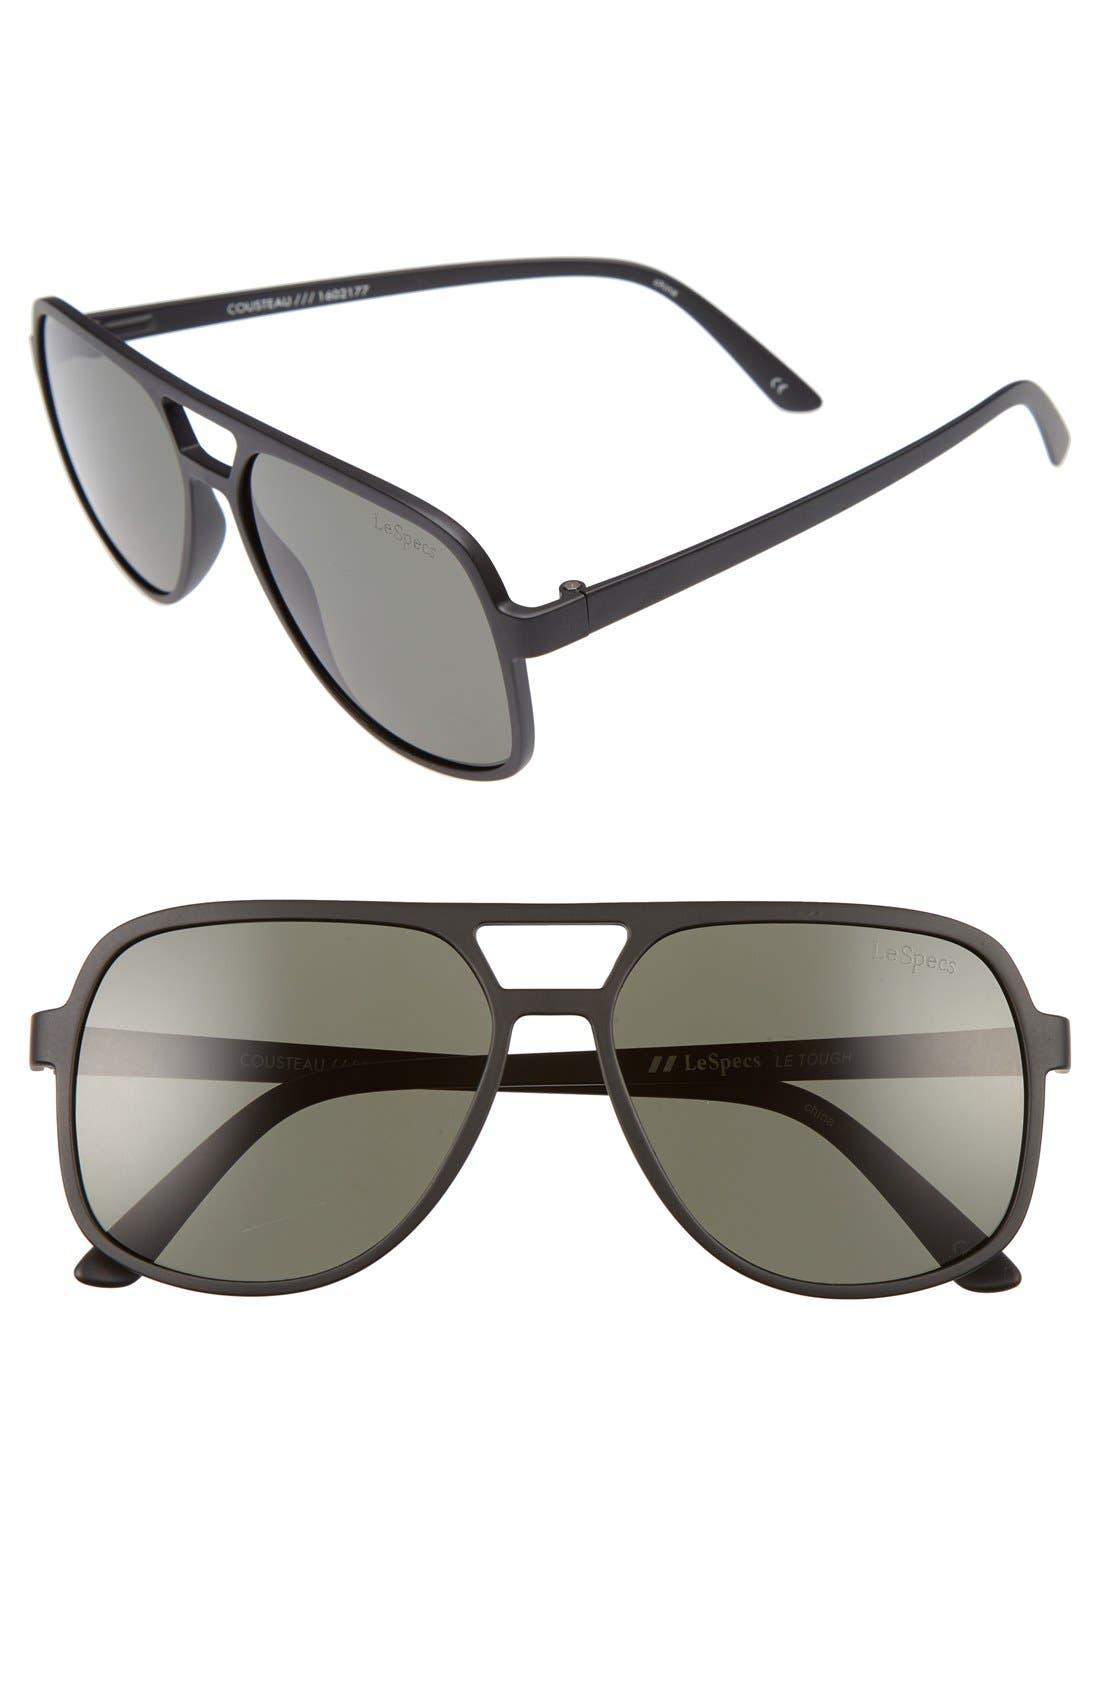 Cousteau 58mm Sunglasses,                             Main thumbnail 1, color,                             001